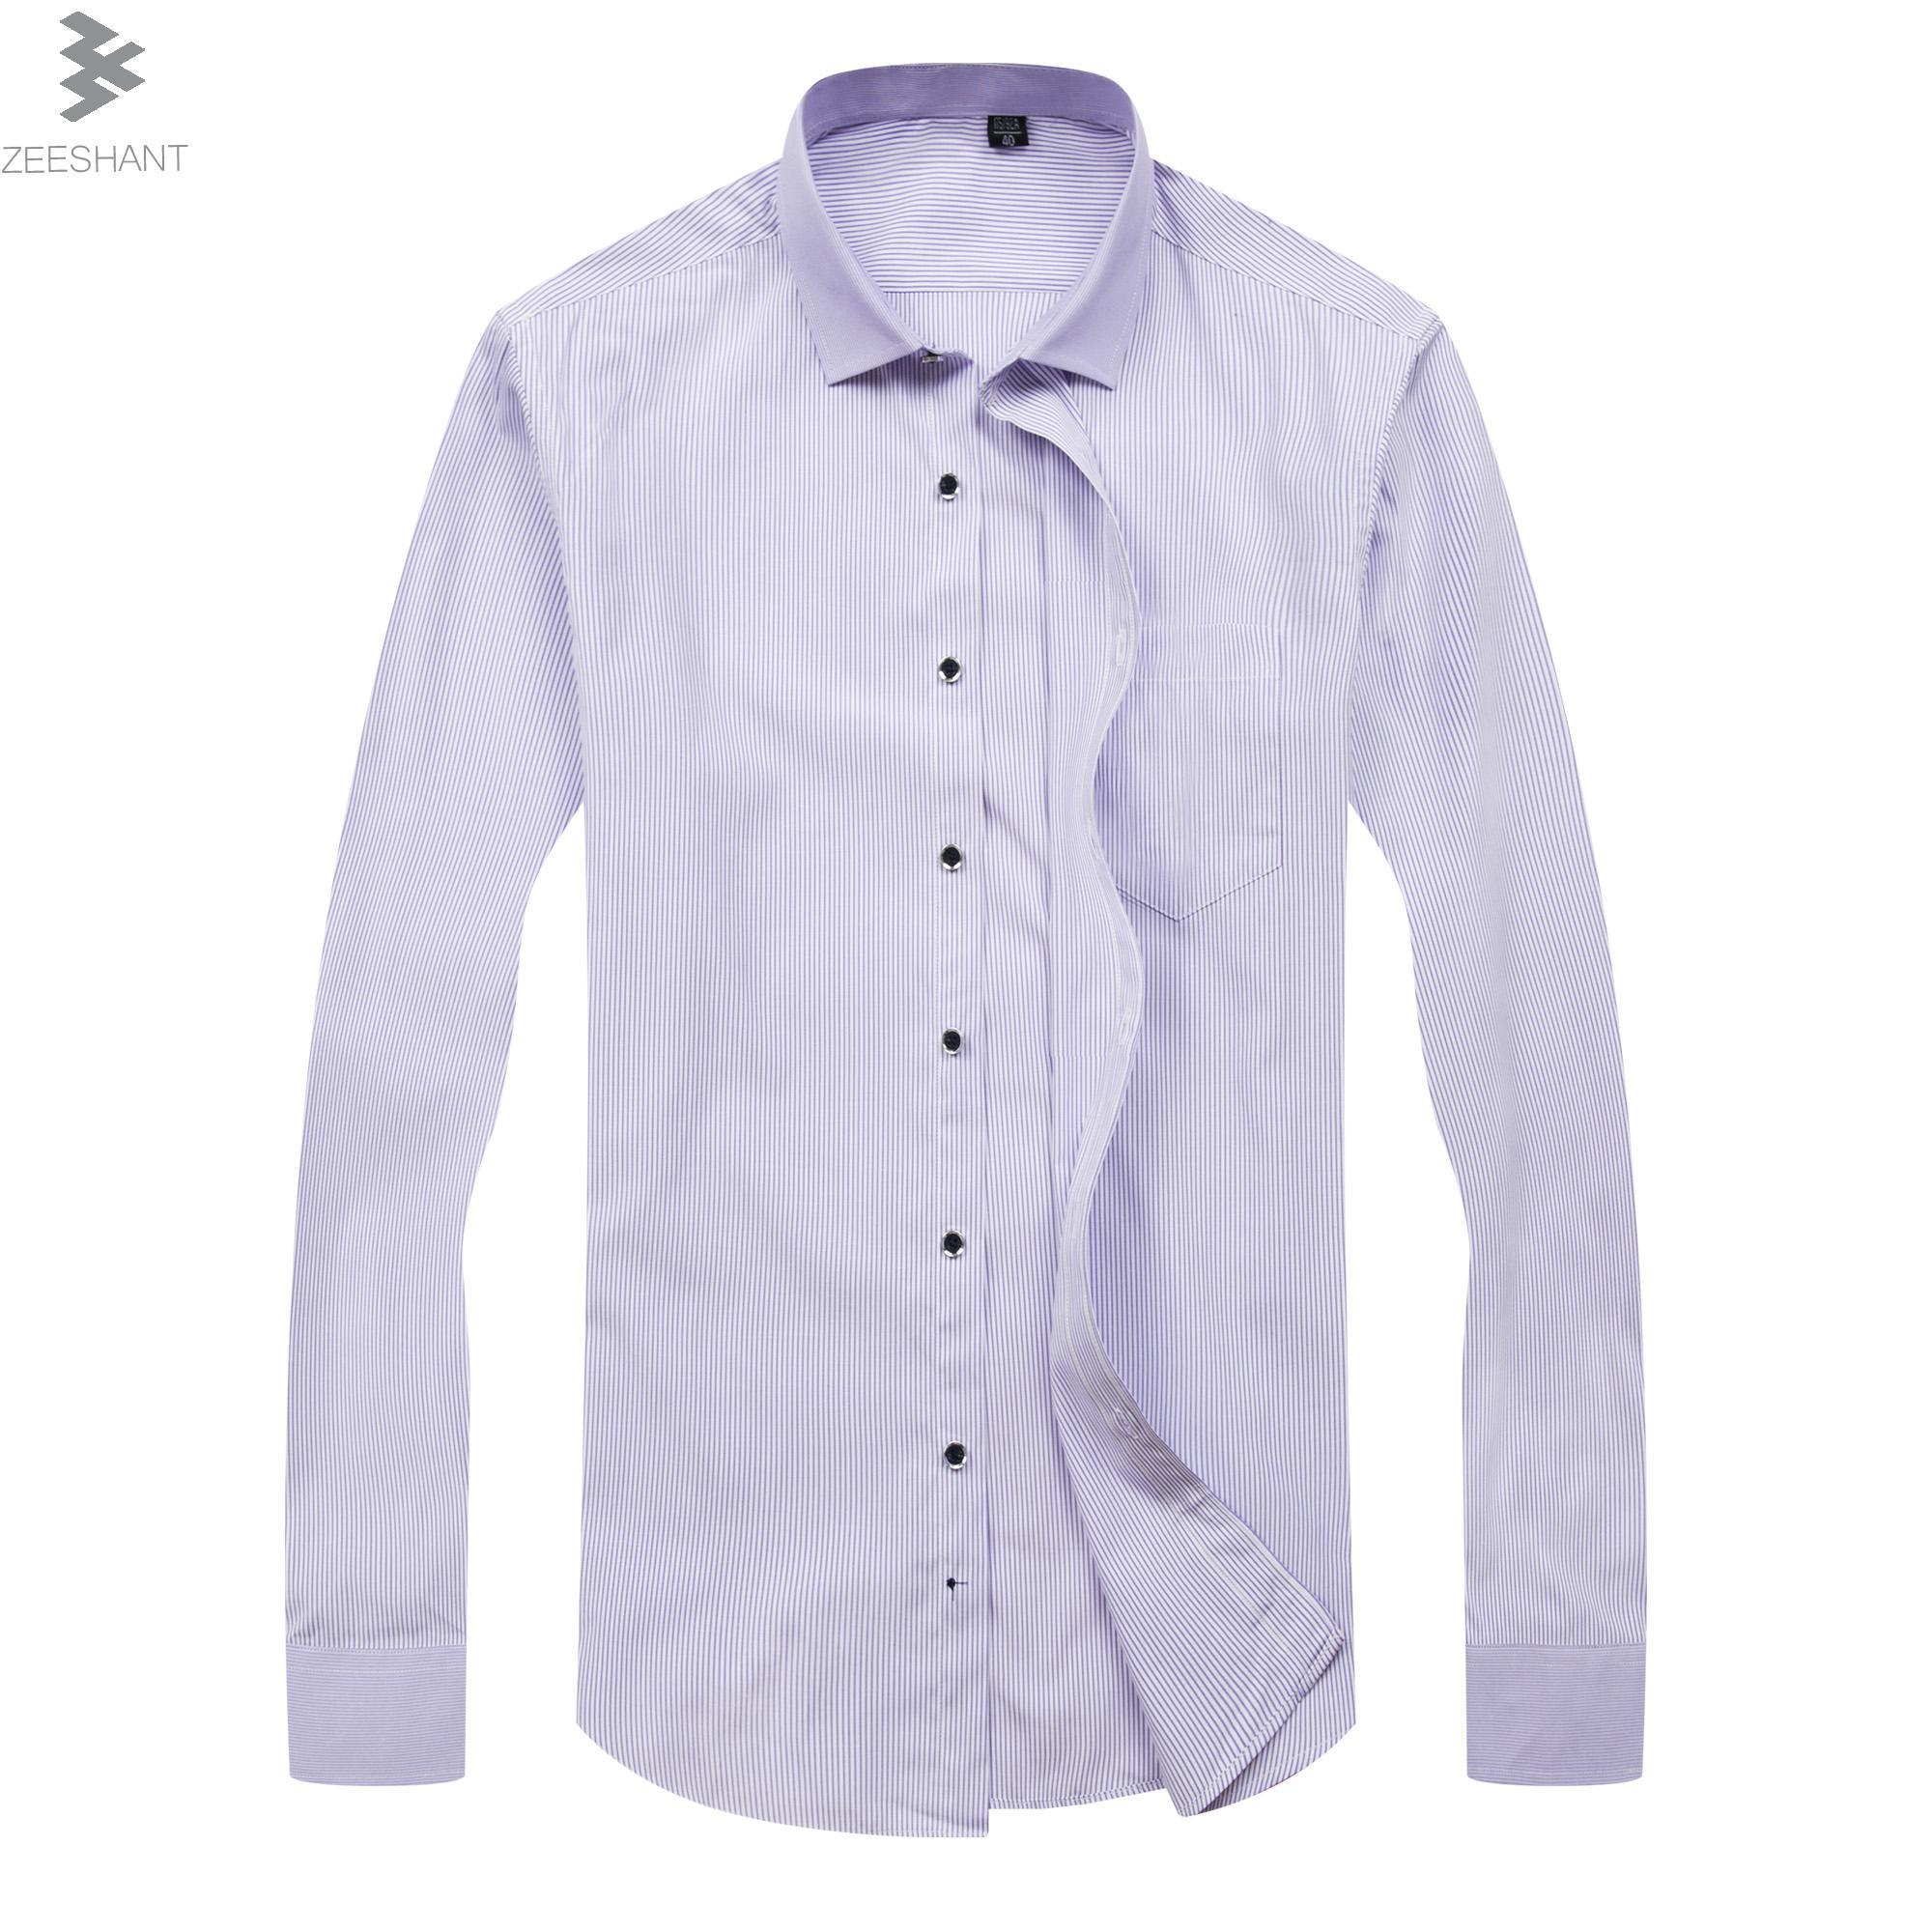 2019 Zeeshant Brand Mens Dress Shirts Long Sleeve Men Shirt Slim Fit